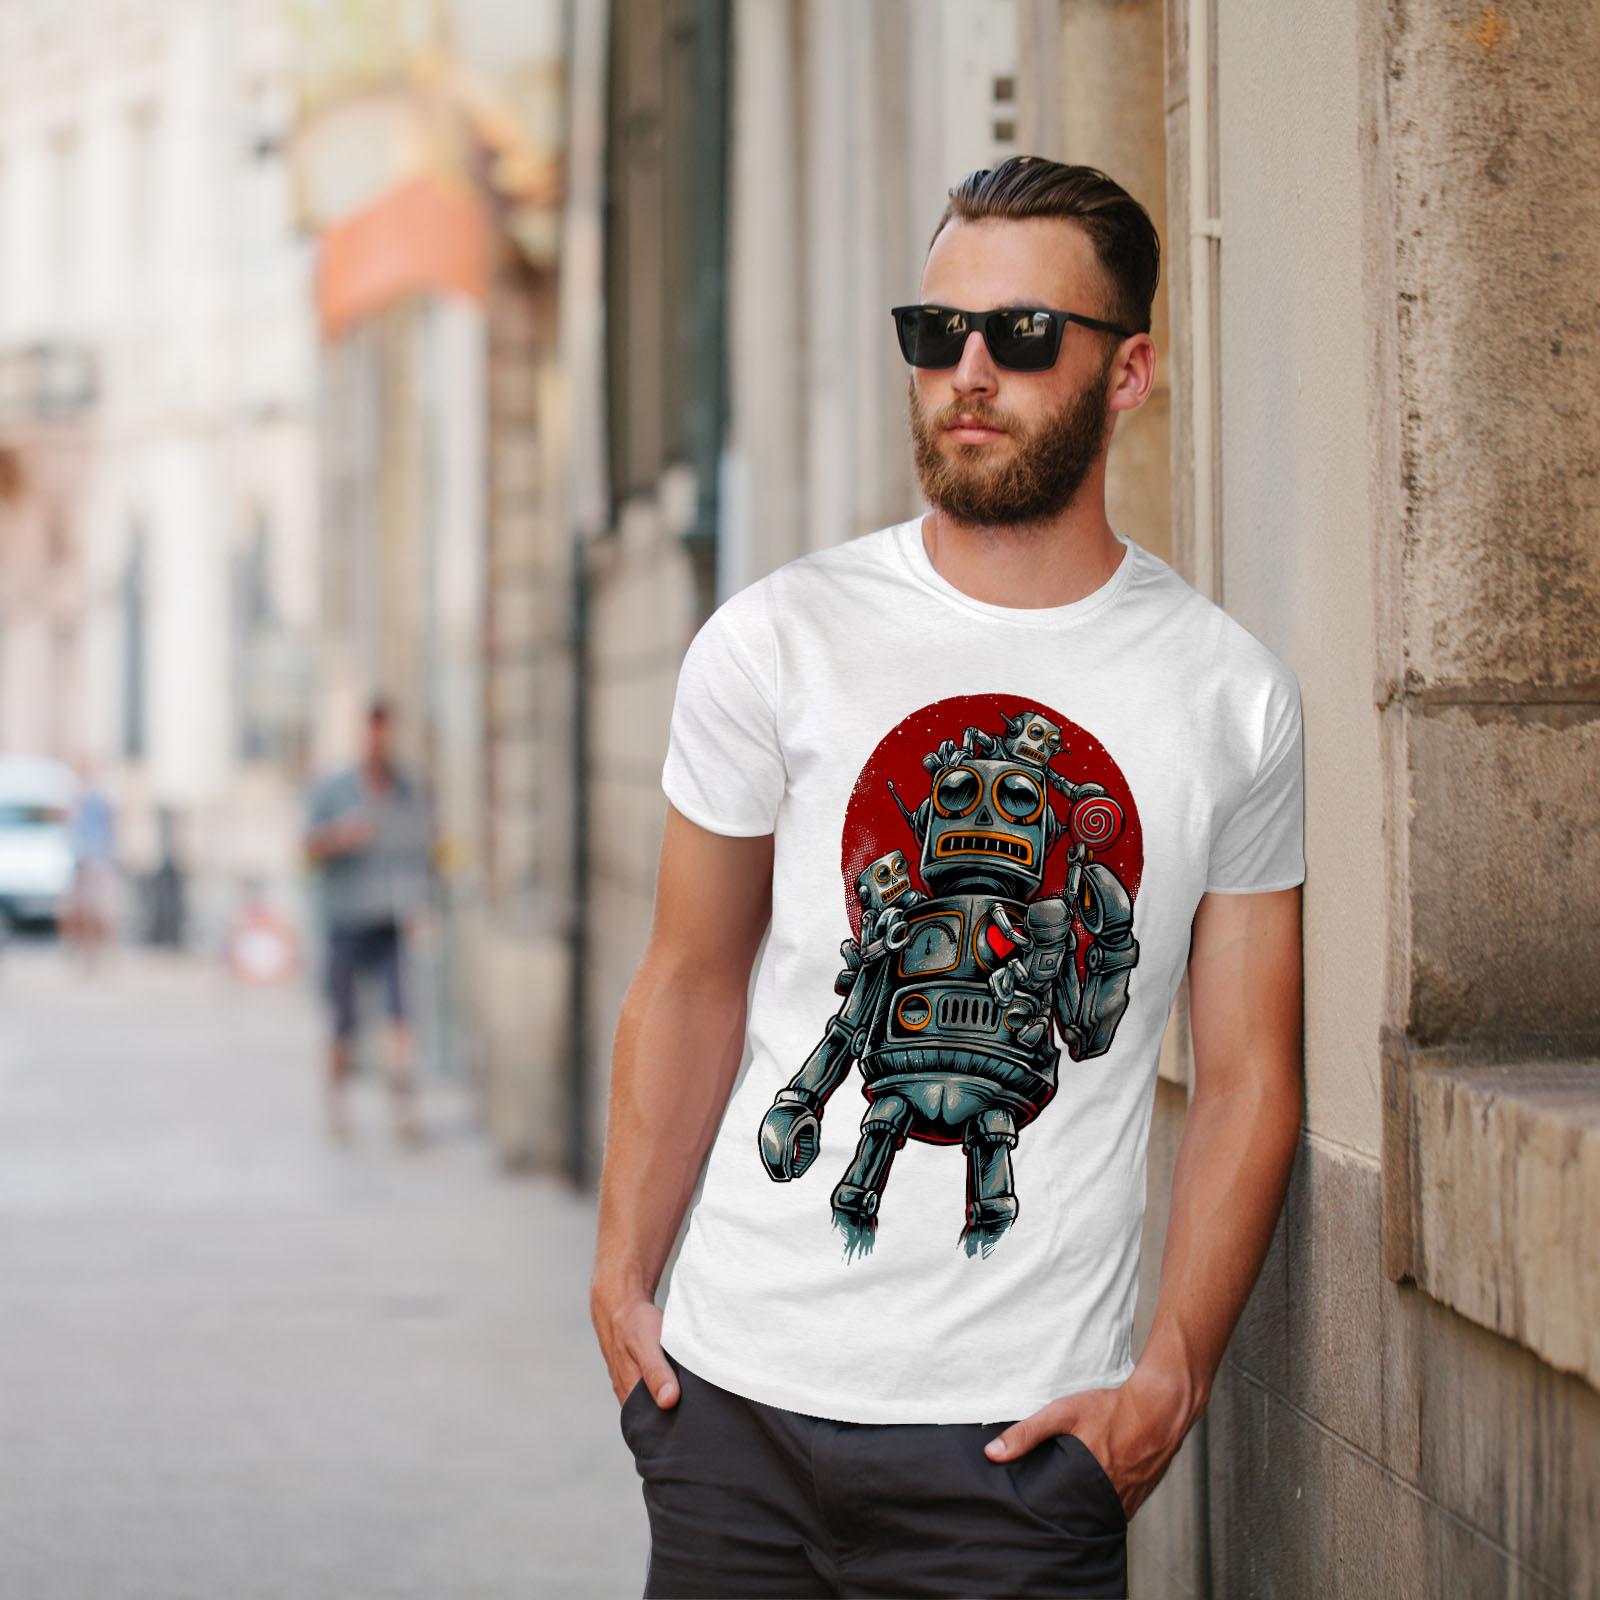 miniature 11 - Wellcoda Crazy Robot Mens T-shirt, Mechanical Graphic Design Printed Tee